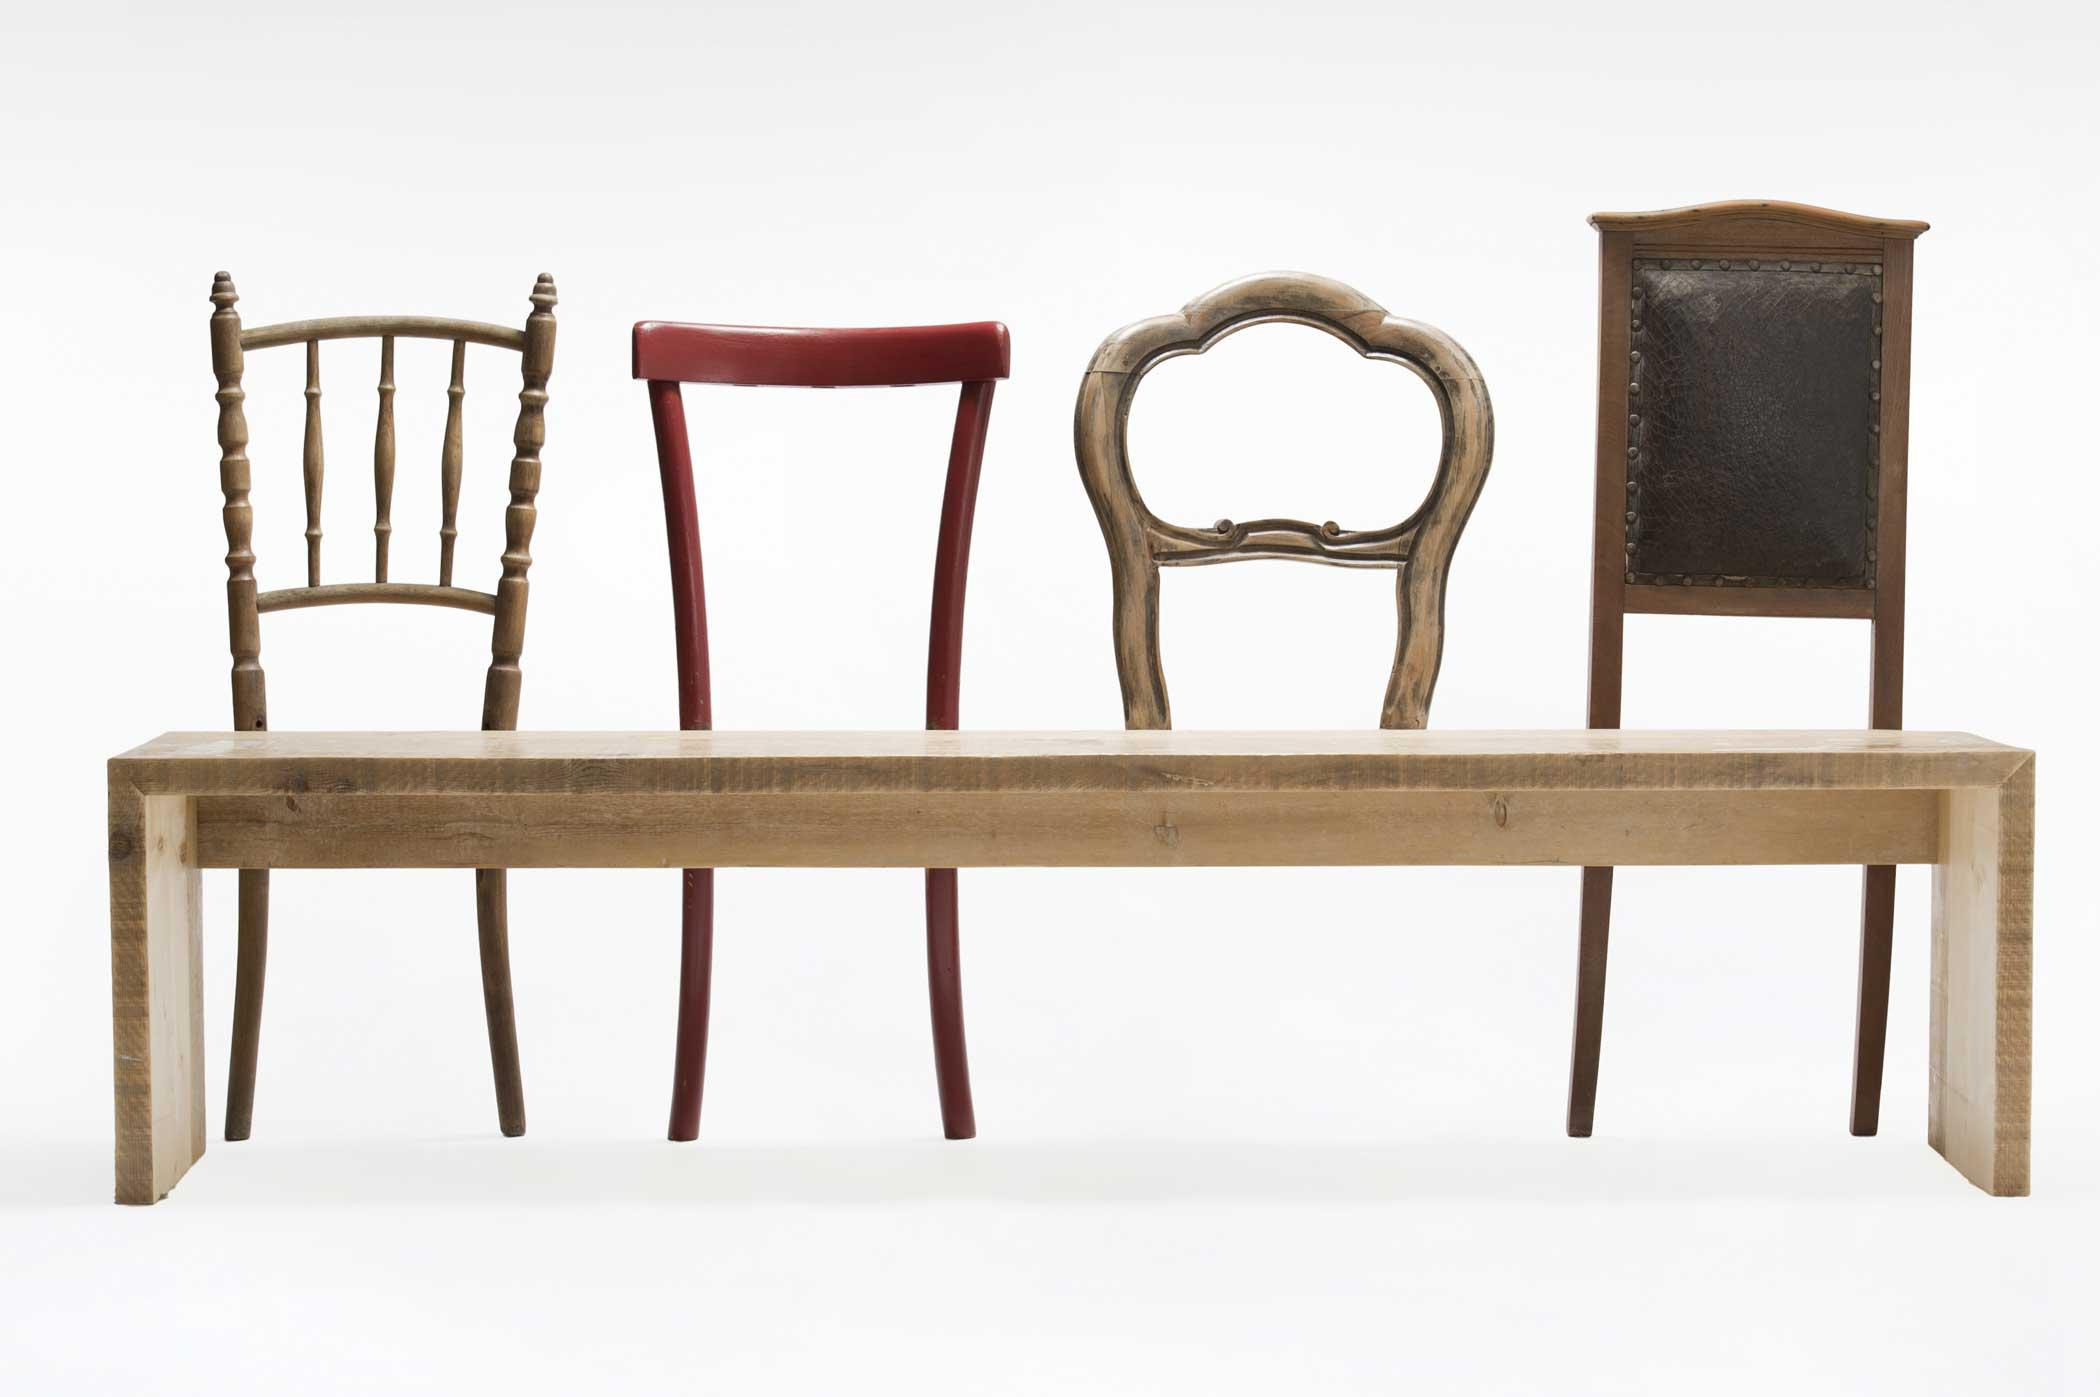 Panca in legno di recupero con vecchie sedie vintage. design de Laquercia21